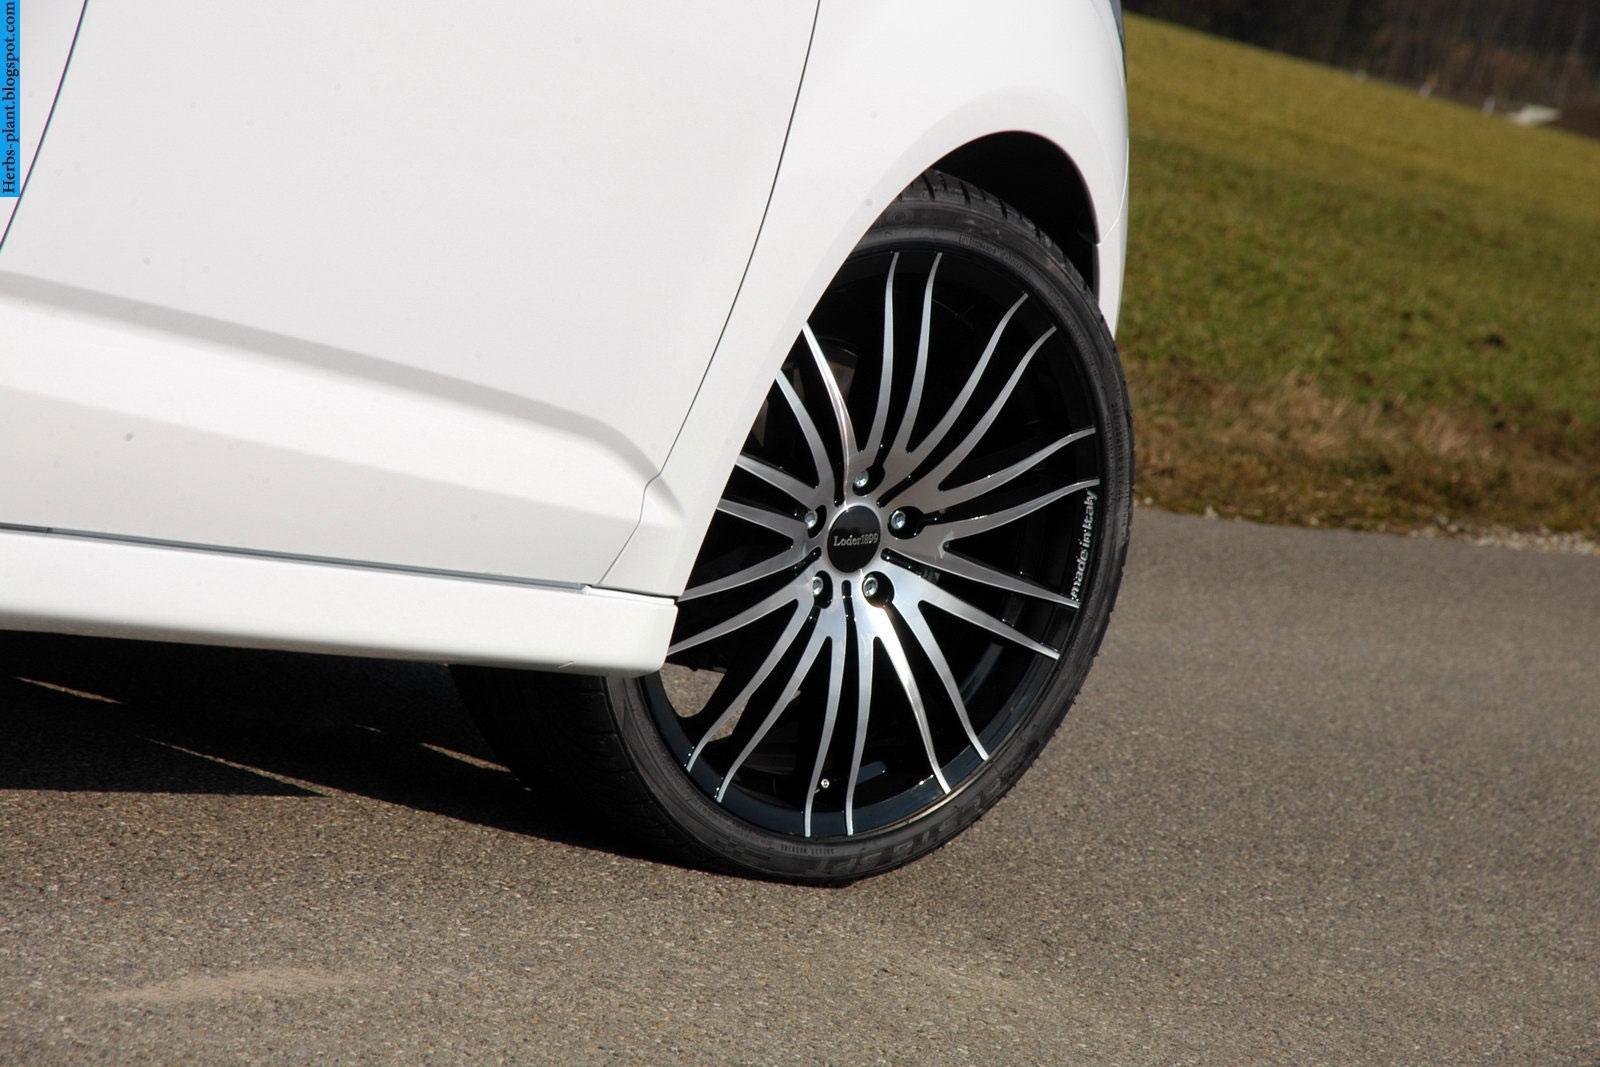 Ford c-max car 2013 tyres/wheels - صور اطارات سيارة فورد سي-ماكس 2013